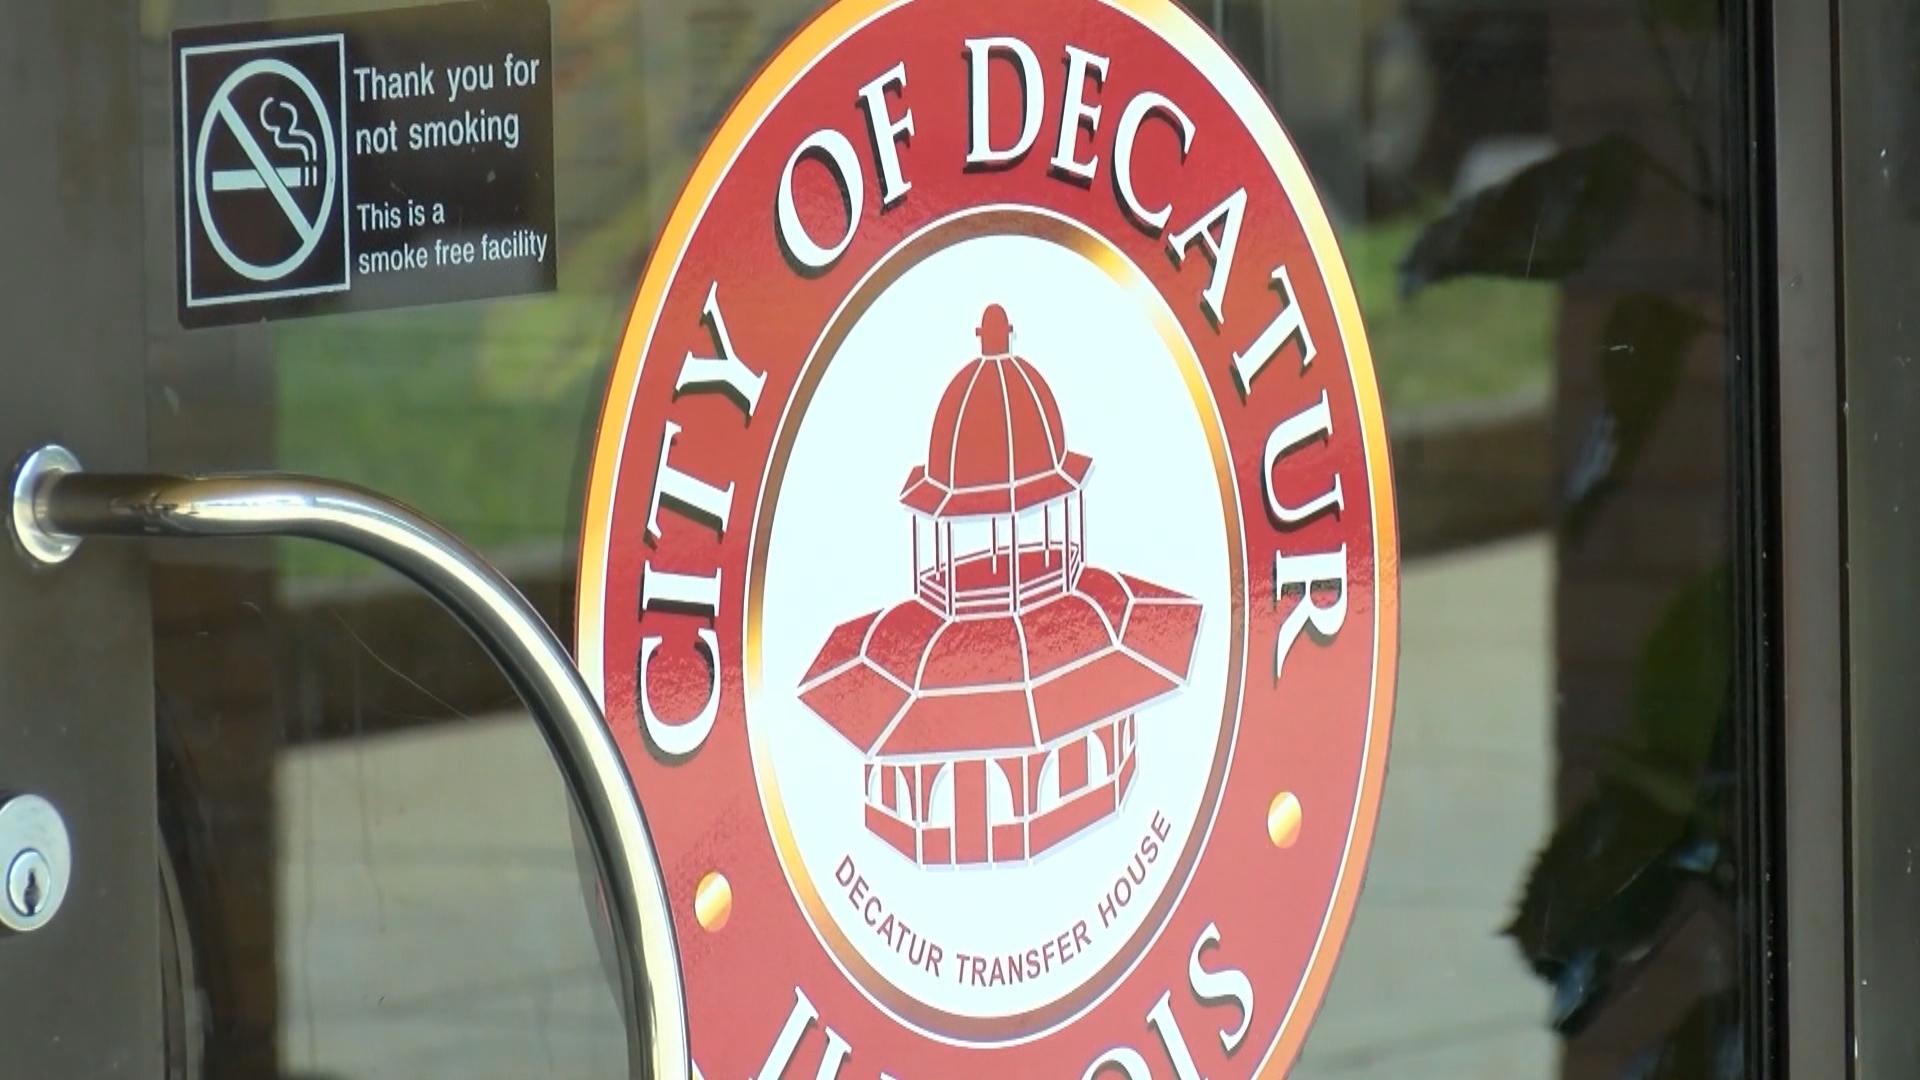 city of decatur_1506461686181.jpg